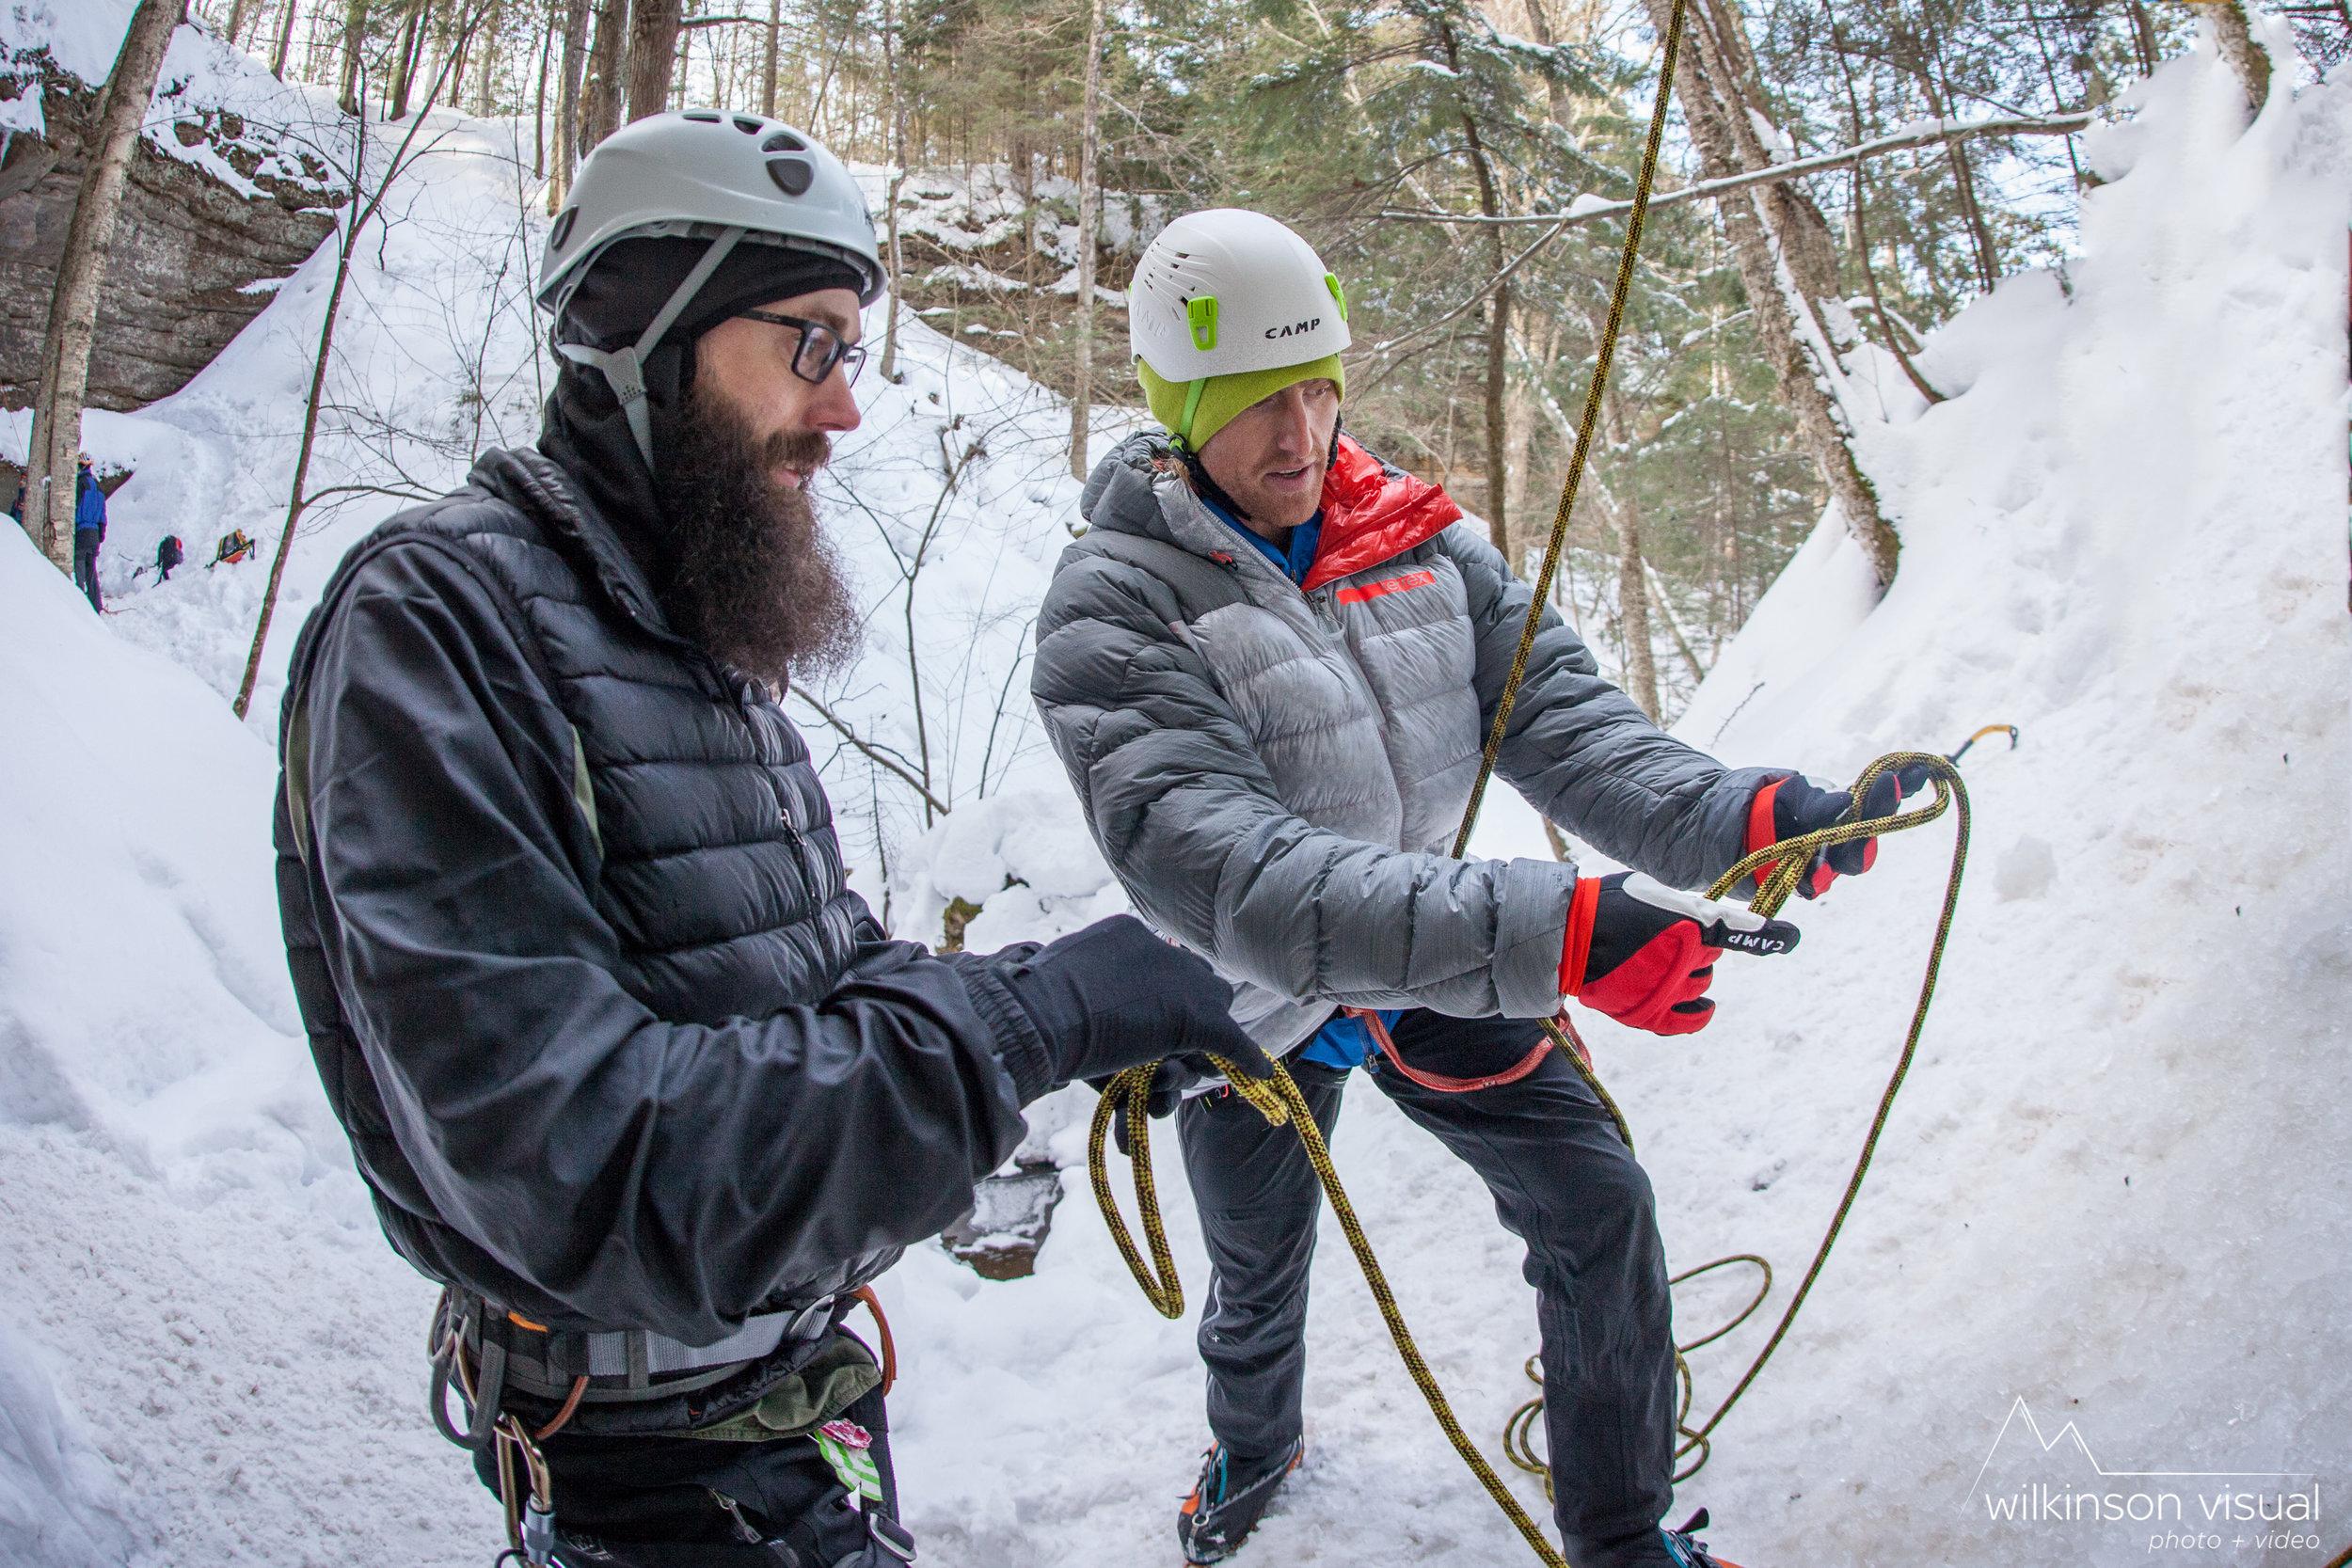 CAMP athlete Ben Edrmann teaches ice climbing in Michigan.